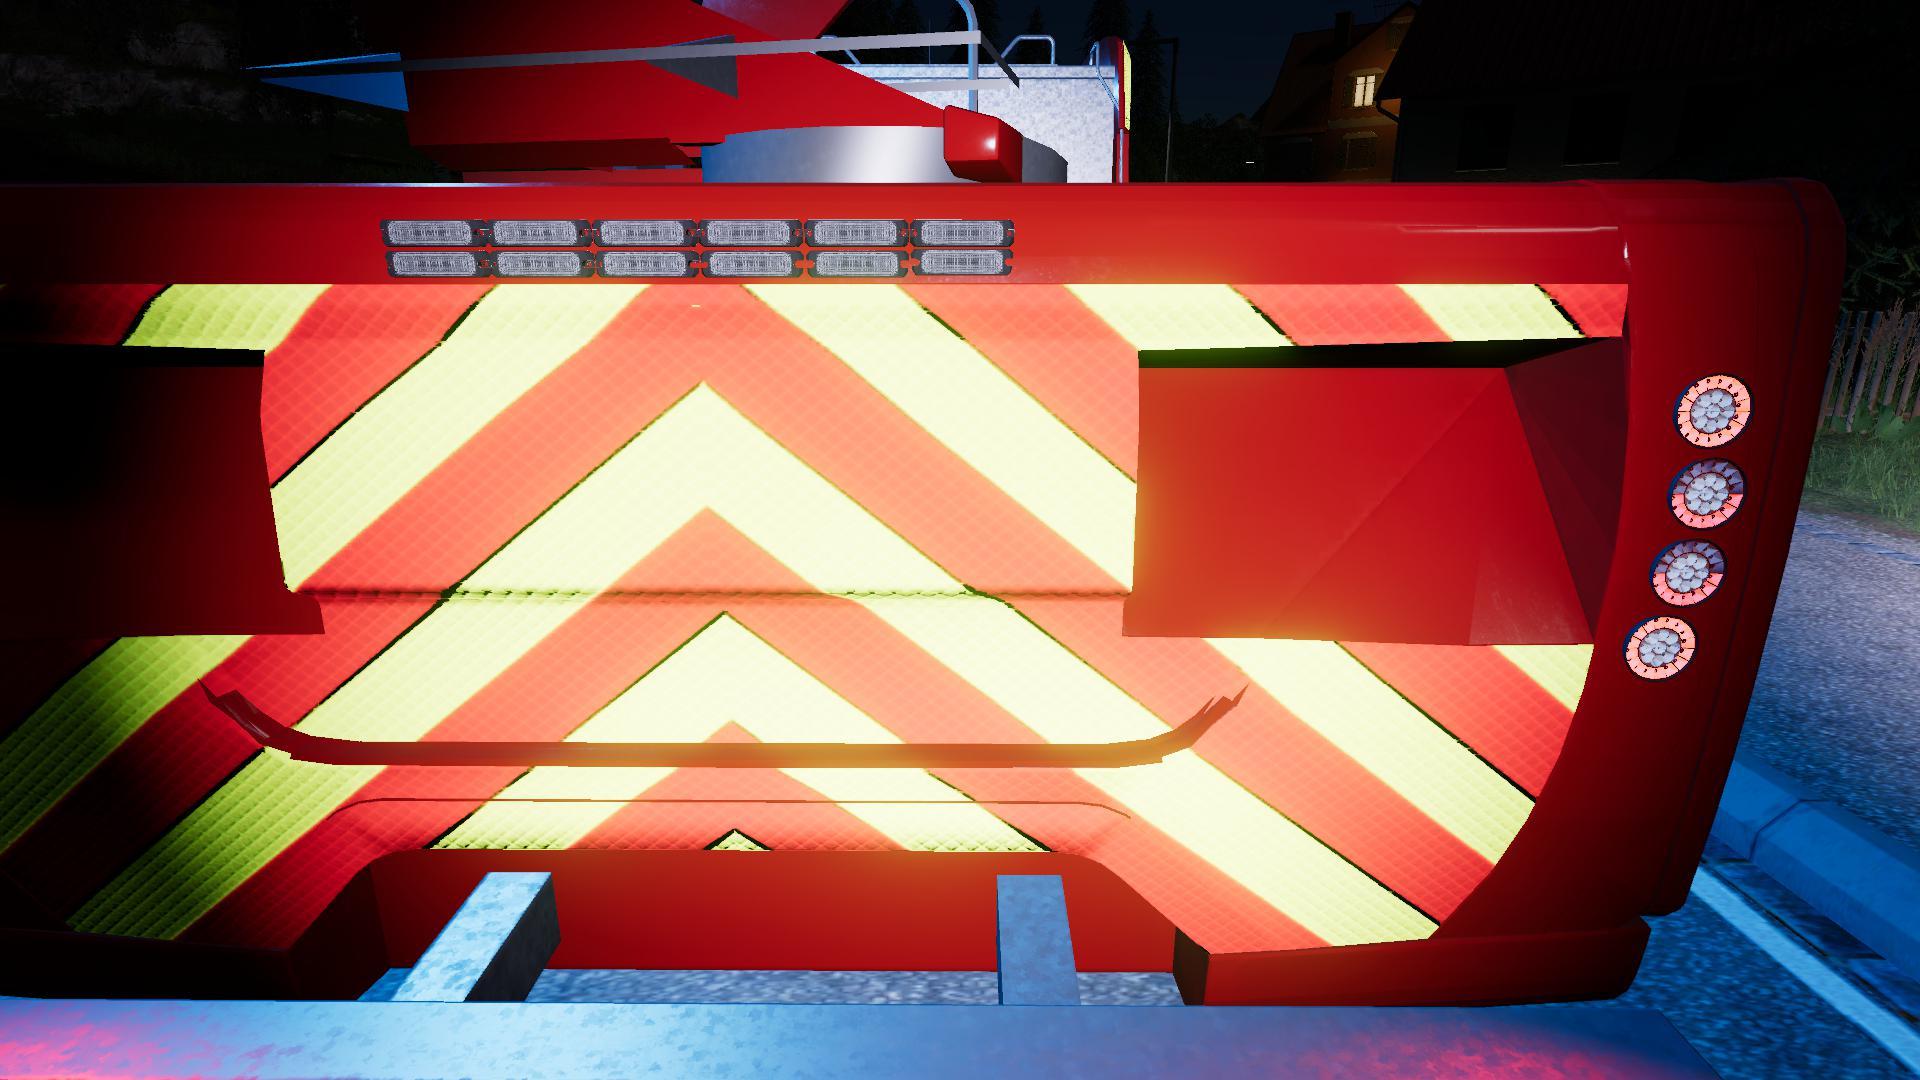 FS19 - ManN Tgm Ladder V1.0